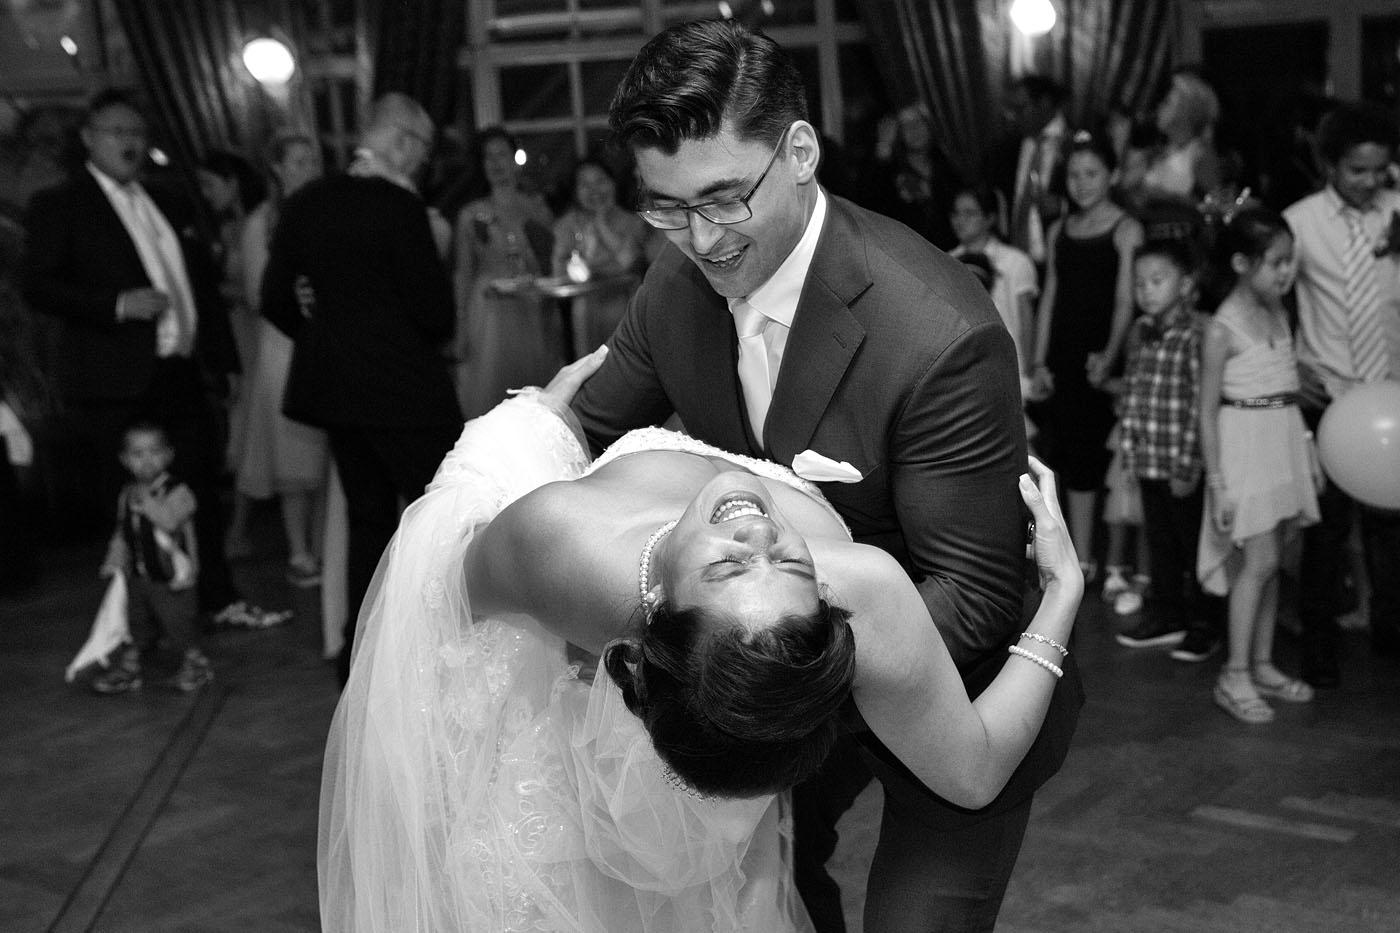 bruiloft-wedding-trouwen-fotograaf-chinees-bobhersbach-rotterdam-feest-dansen